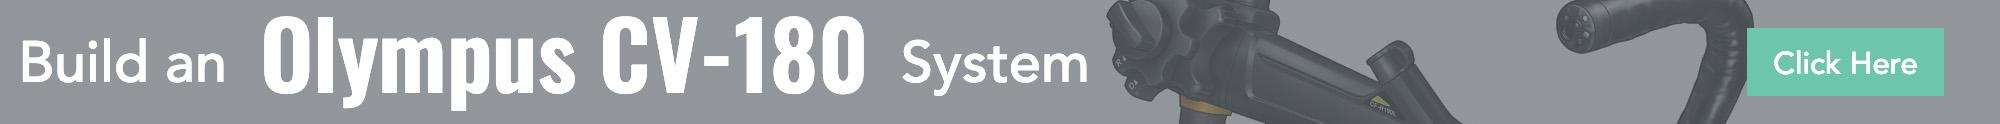 Olympus CV-180 Video System